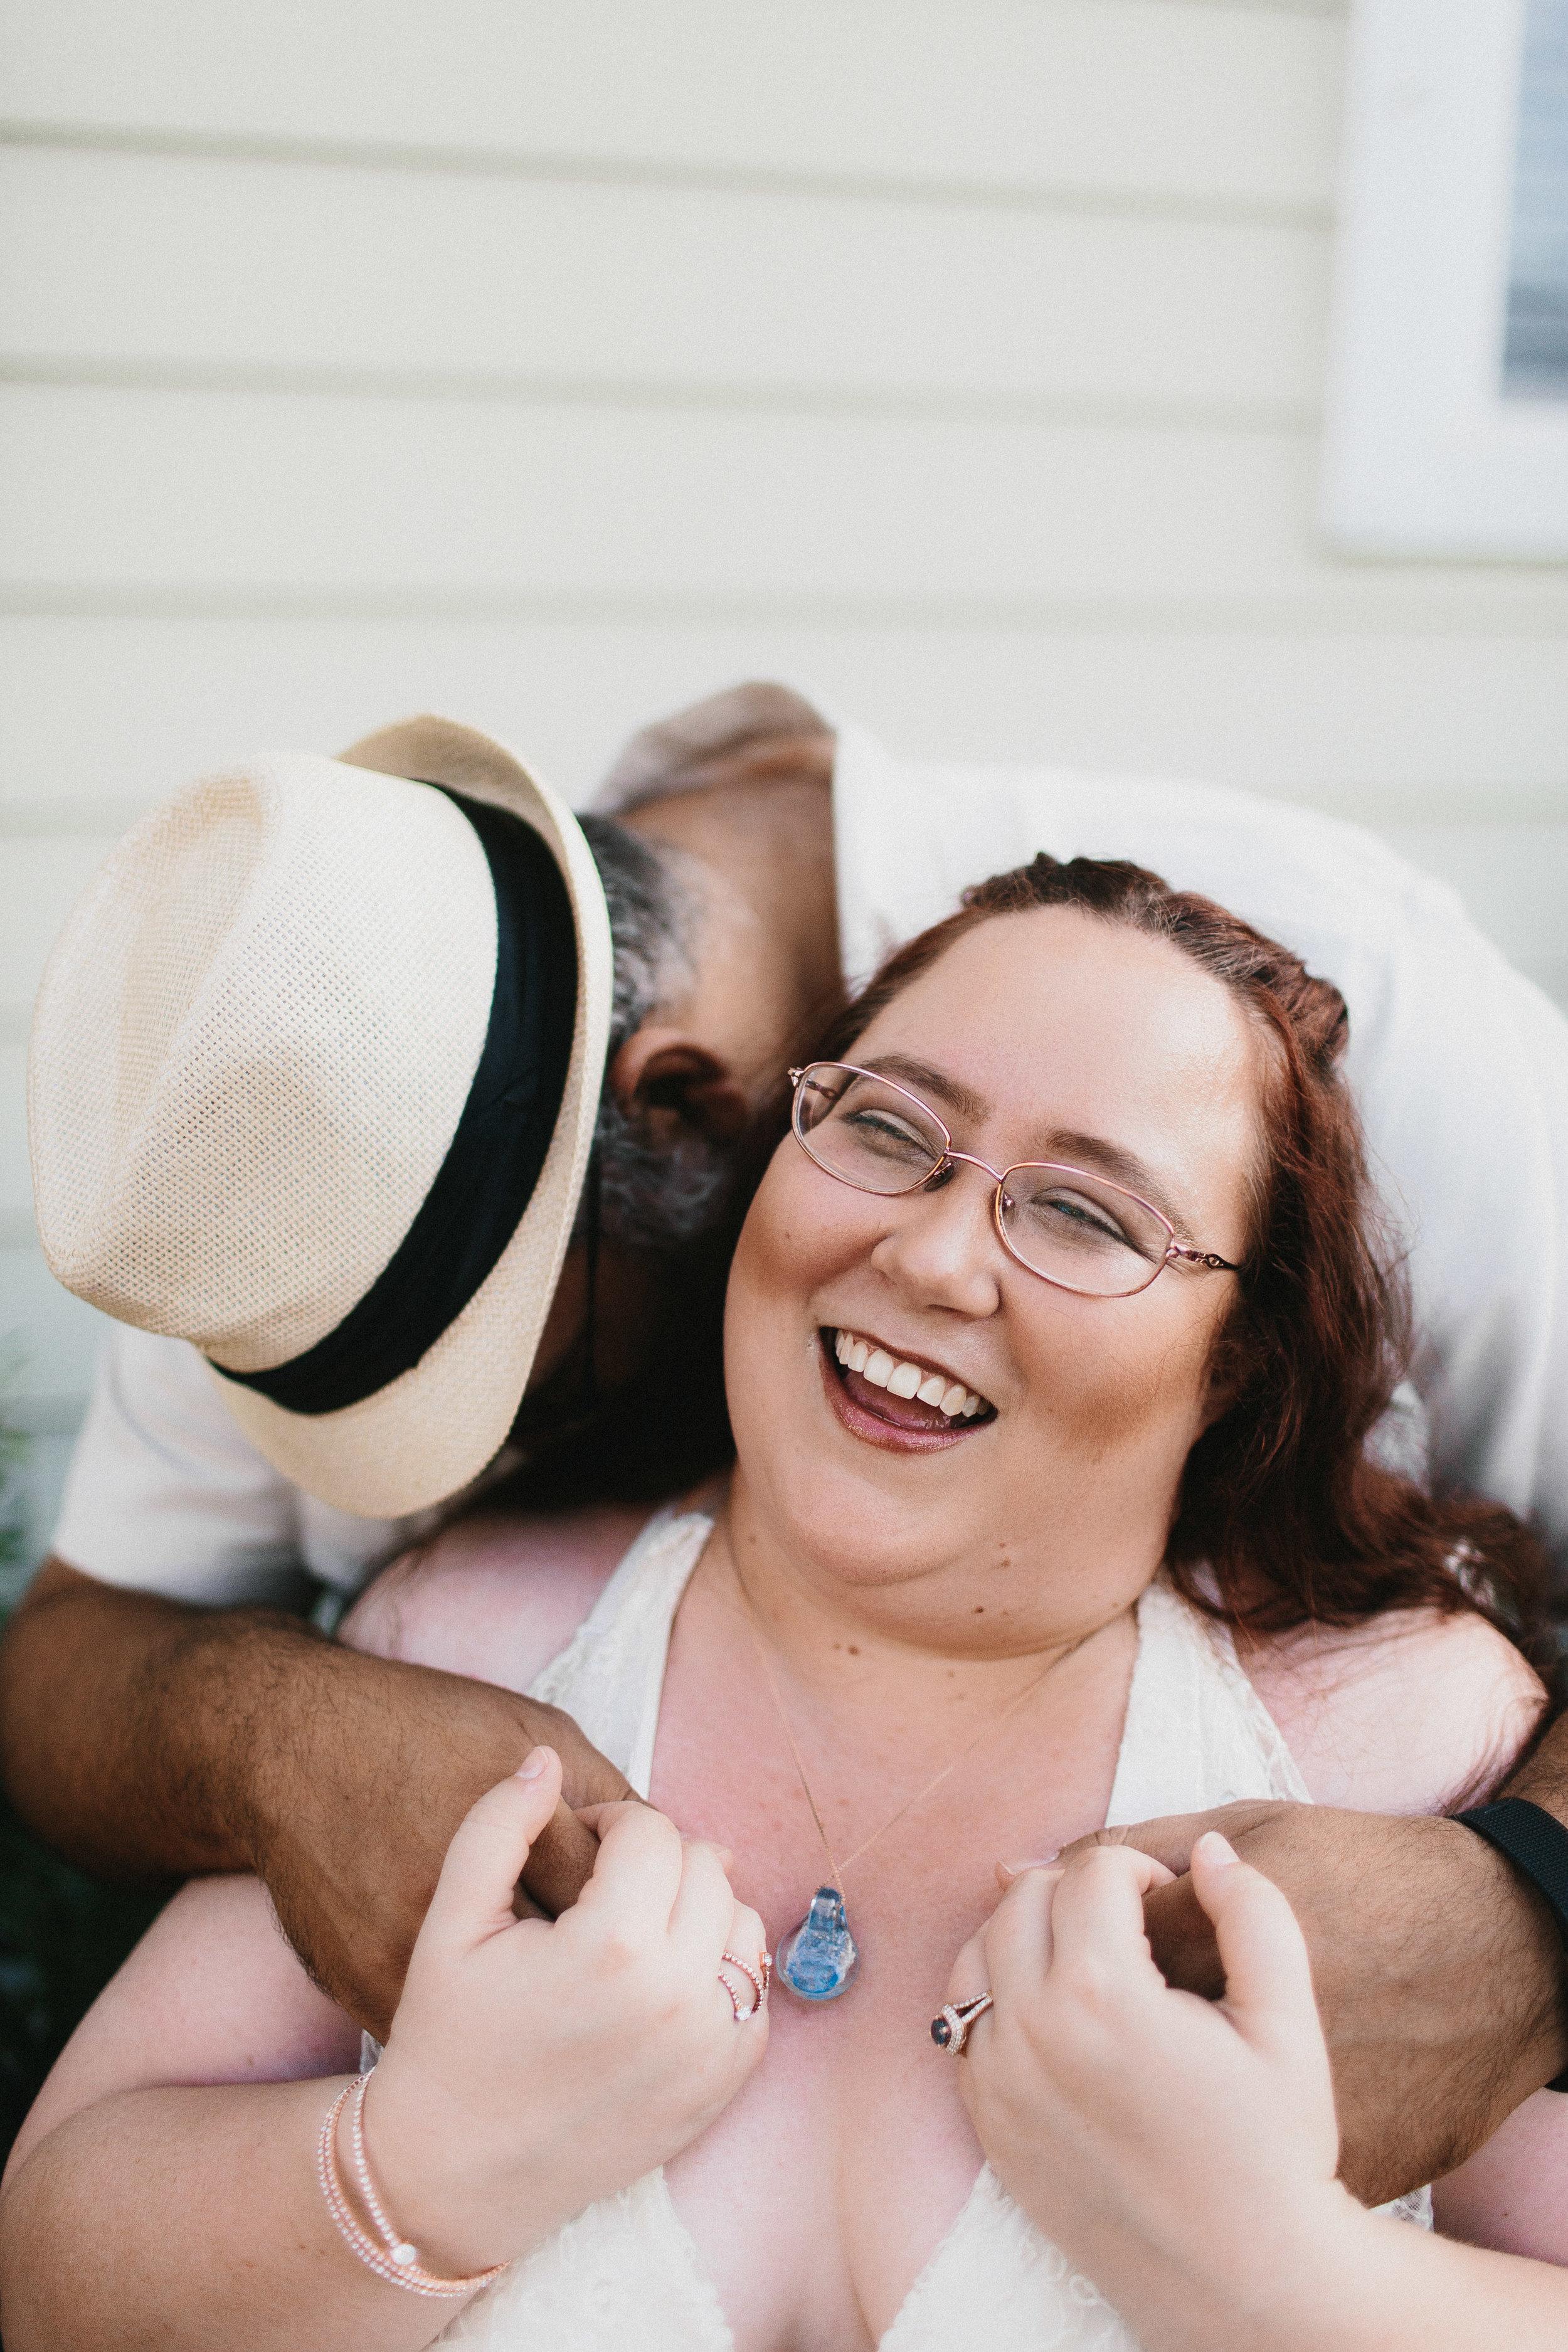 destin_sunset_beach_elopement_intimate_wedding_photographer_florida_documentary_1102.jpg